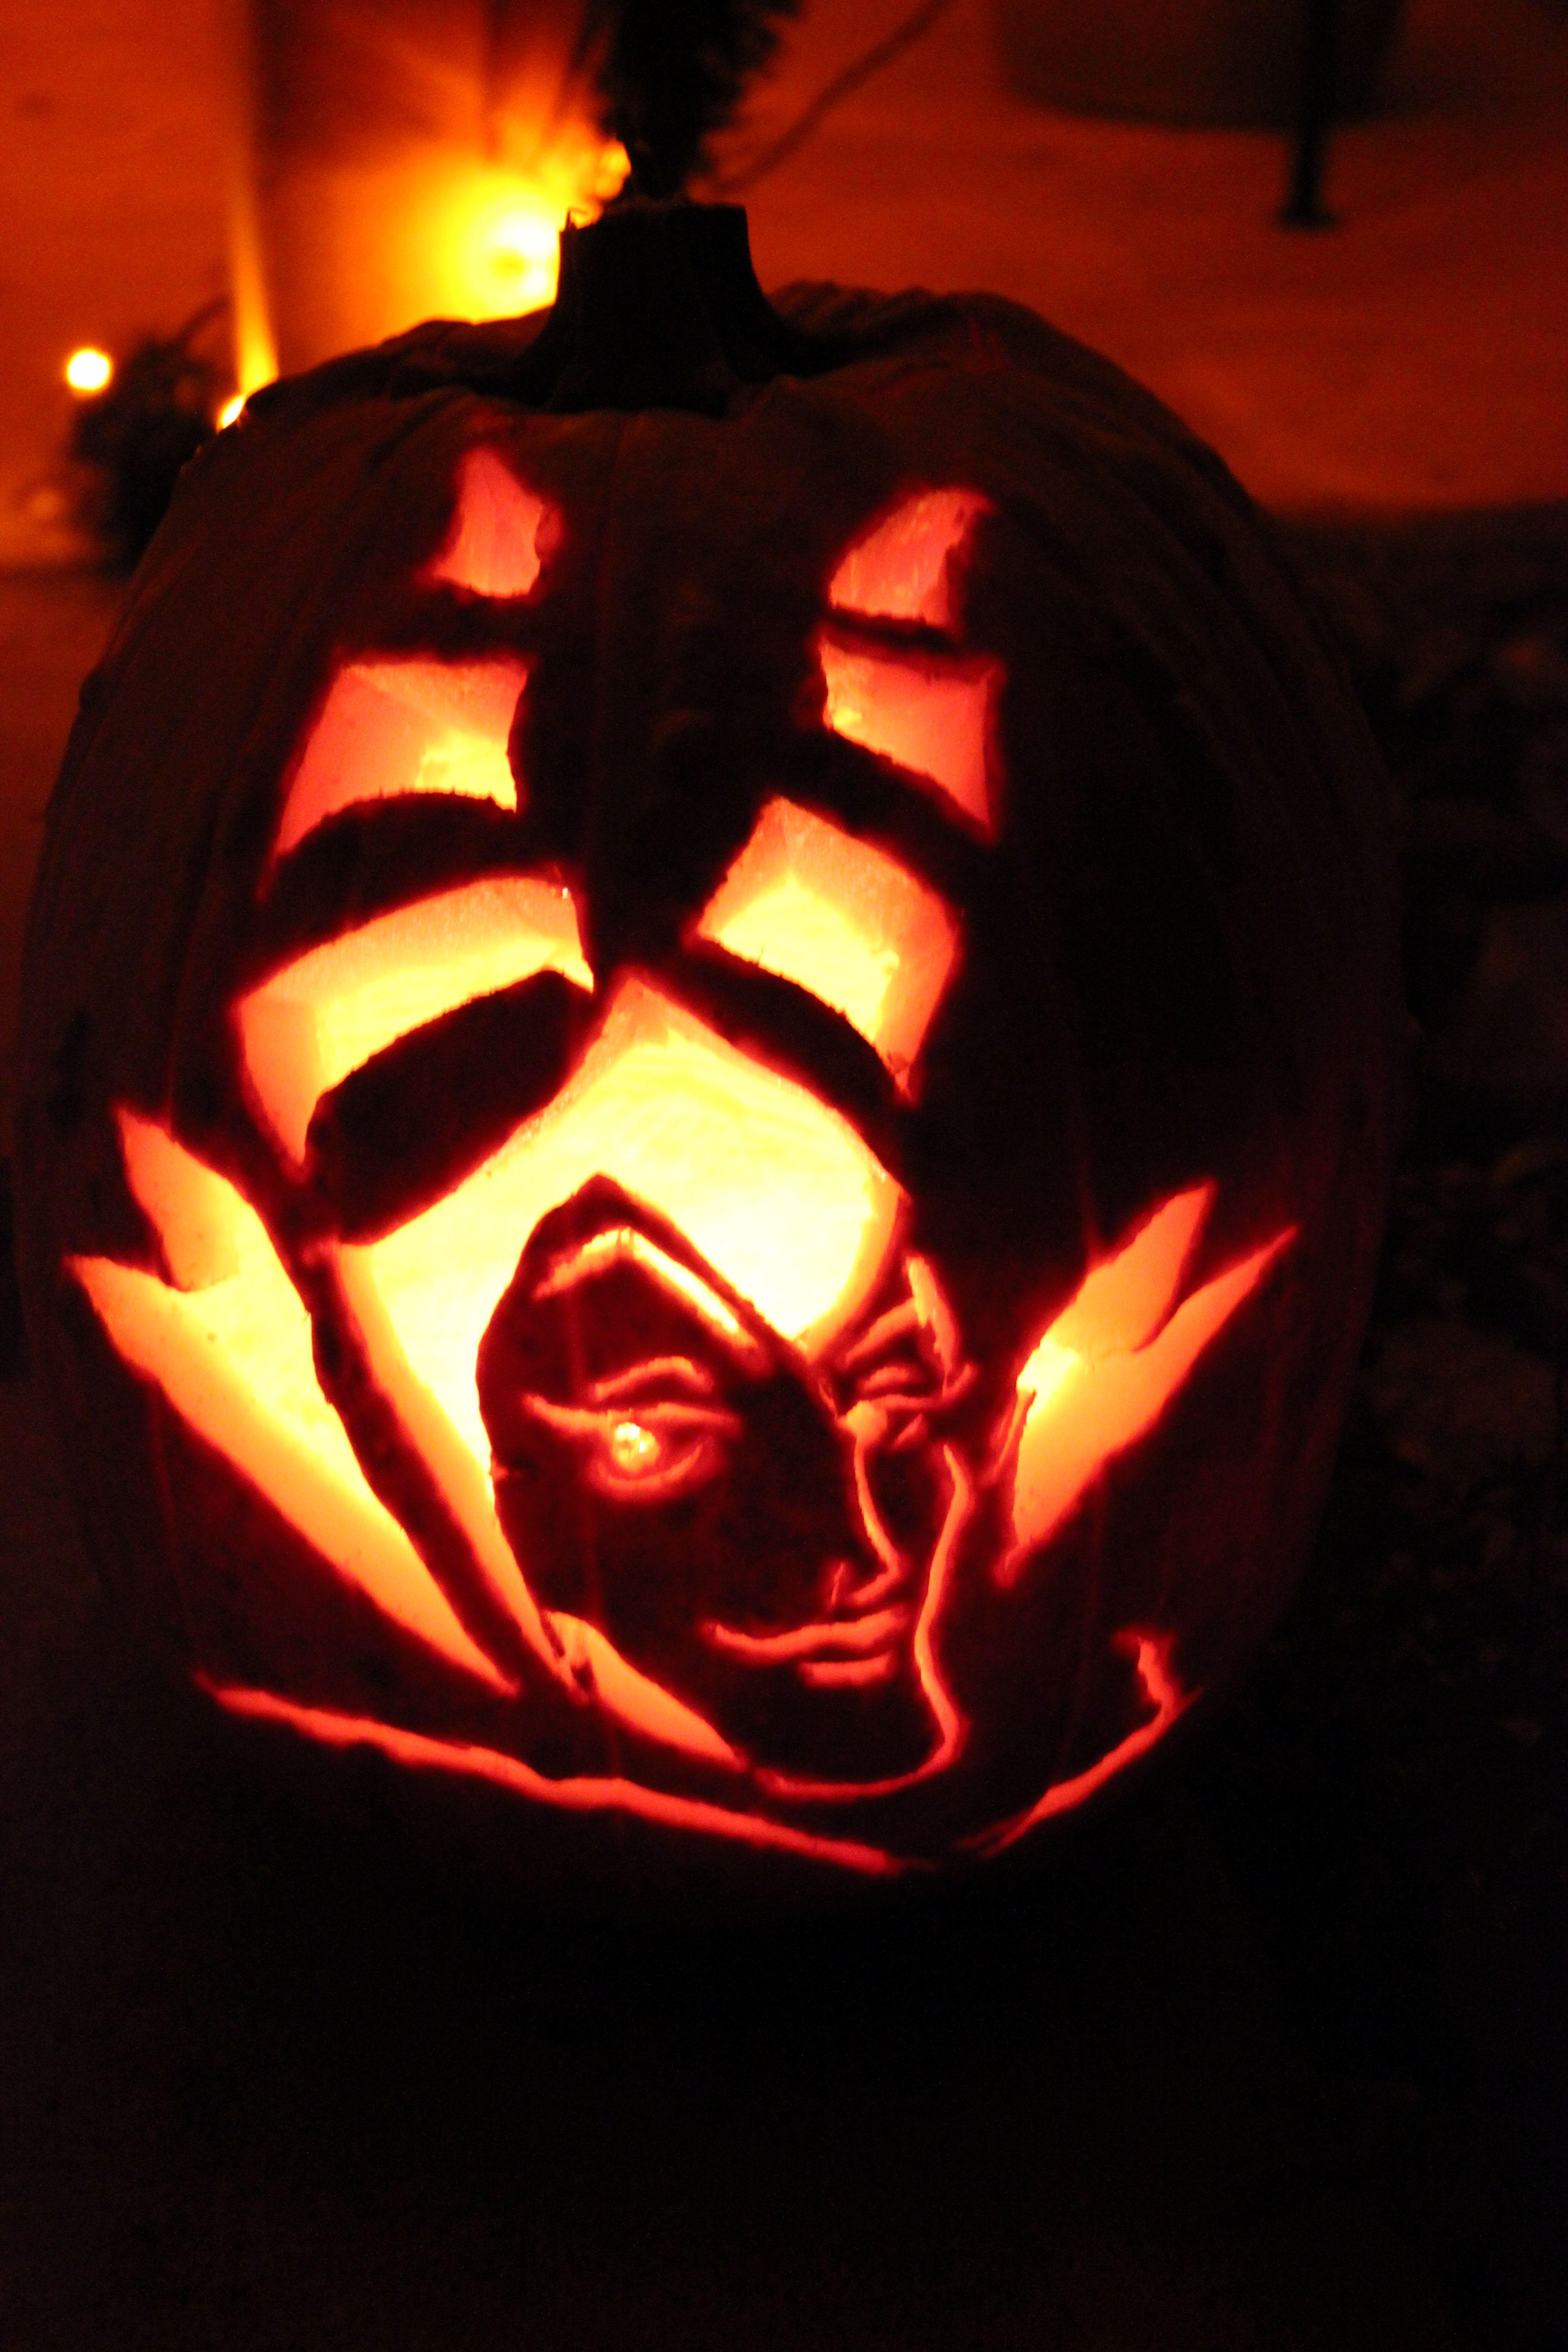 My Pattern Template Free Carved Pumpkin Sleeping Beauty S